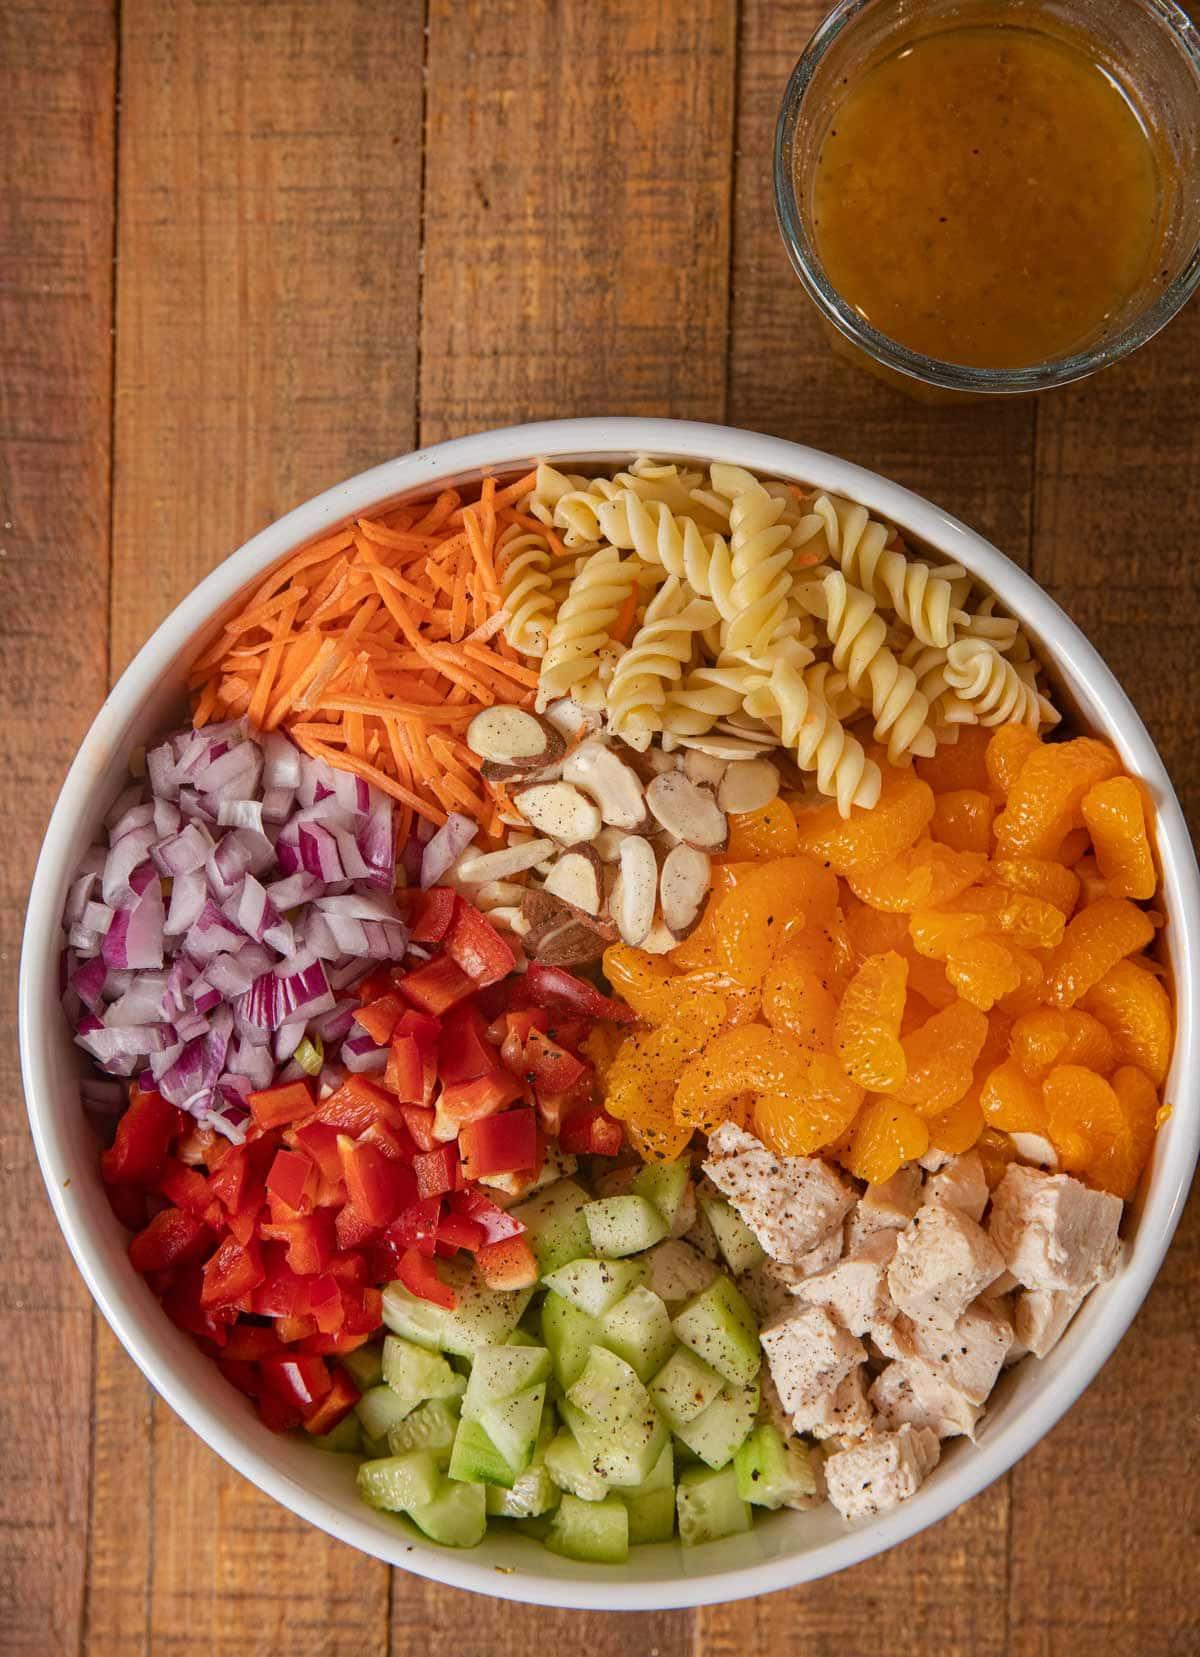 Mandarin Chicken Pasta Salad ingredients in white bowl